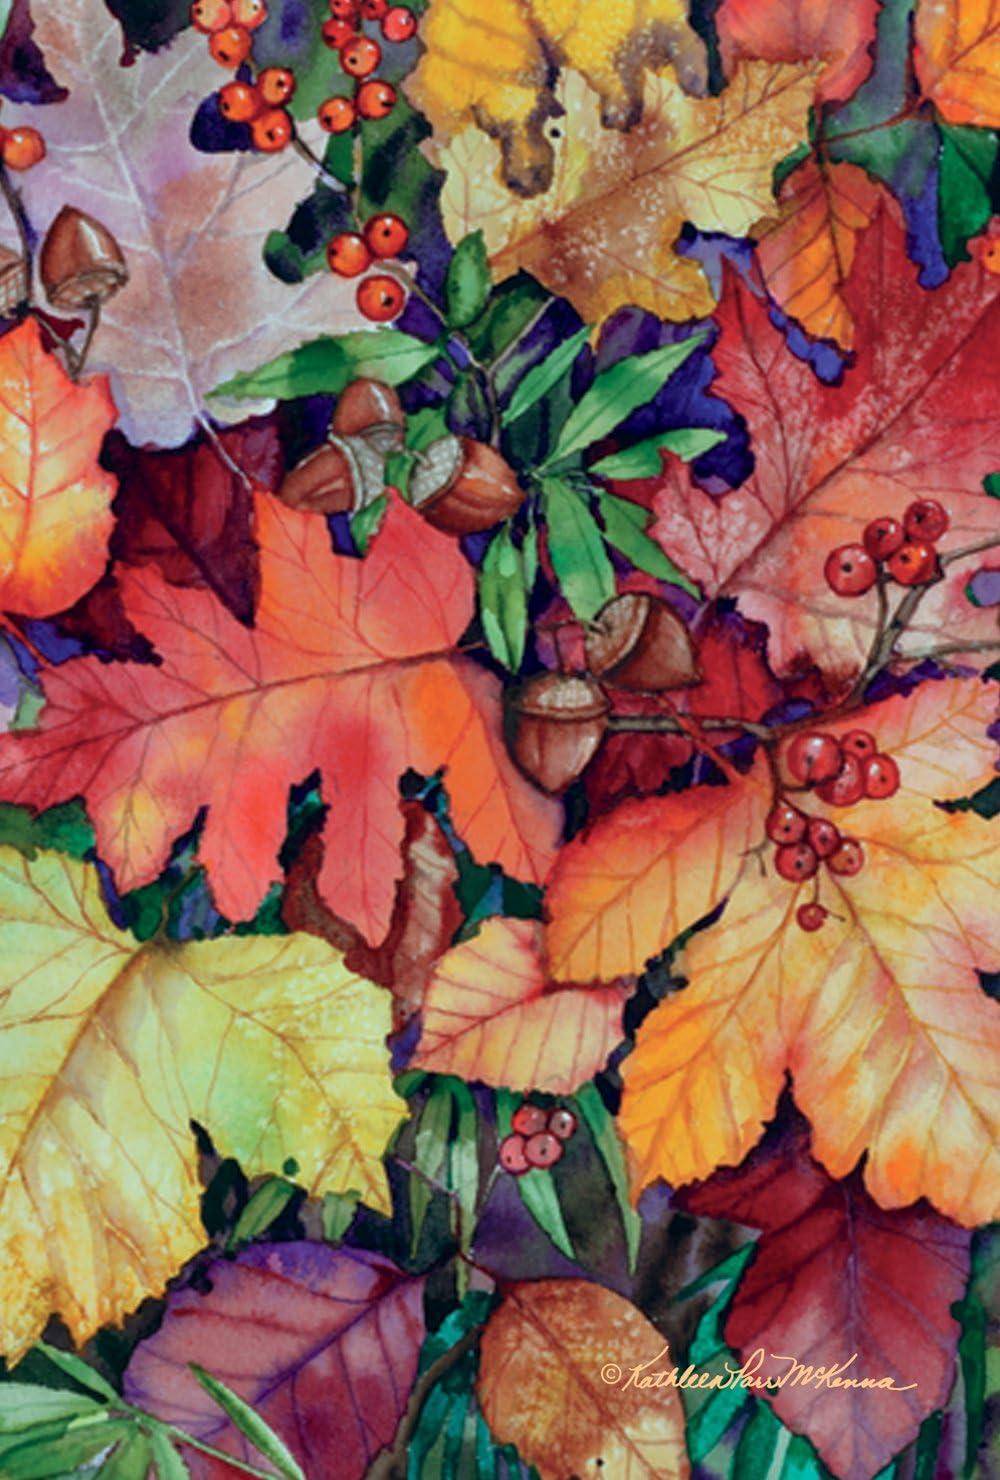 Toland Home Garden Fallen Leaves 28 x 40 Inch Decorative Fall Autumn Leaf Acorn Berries House Flag